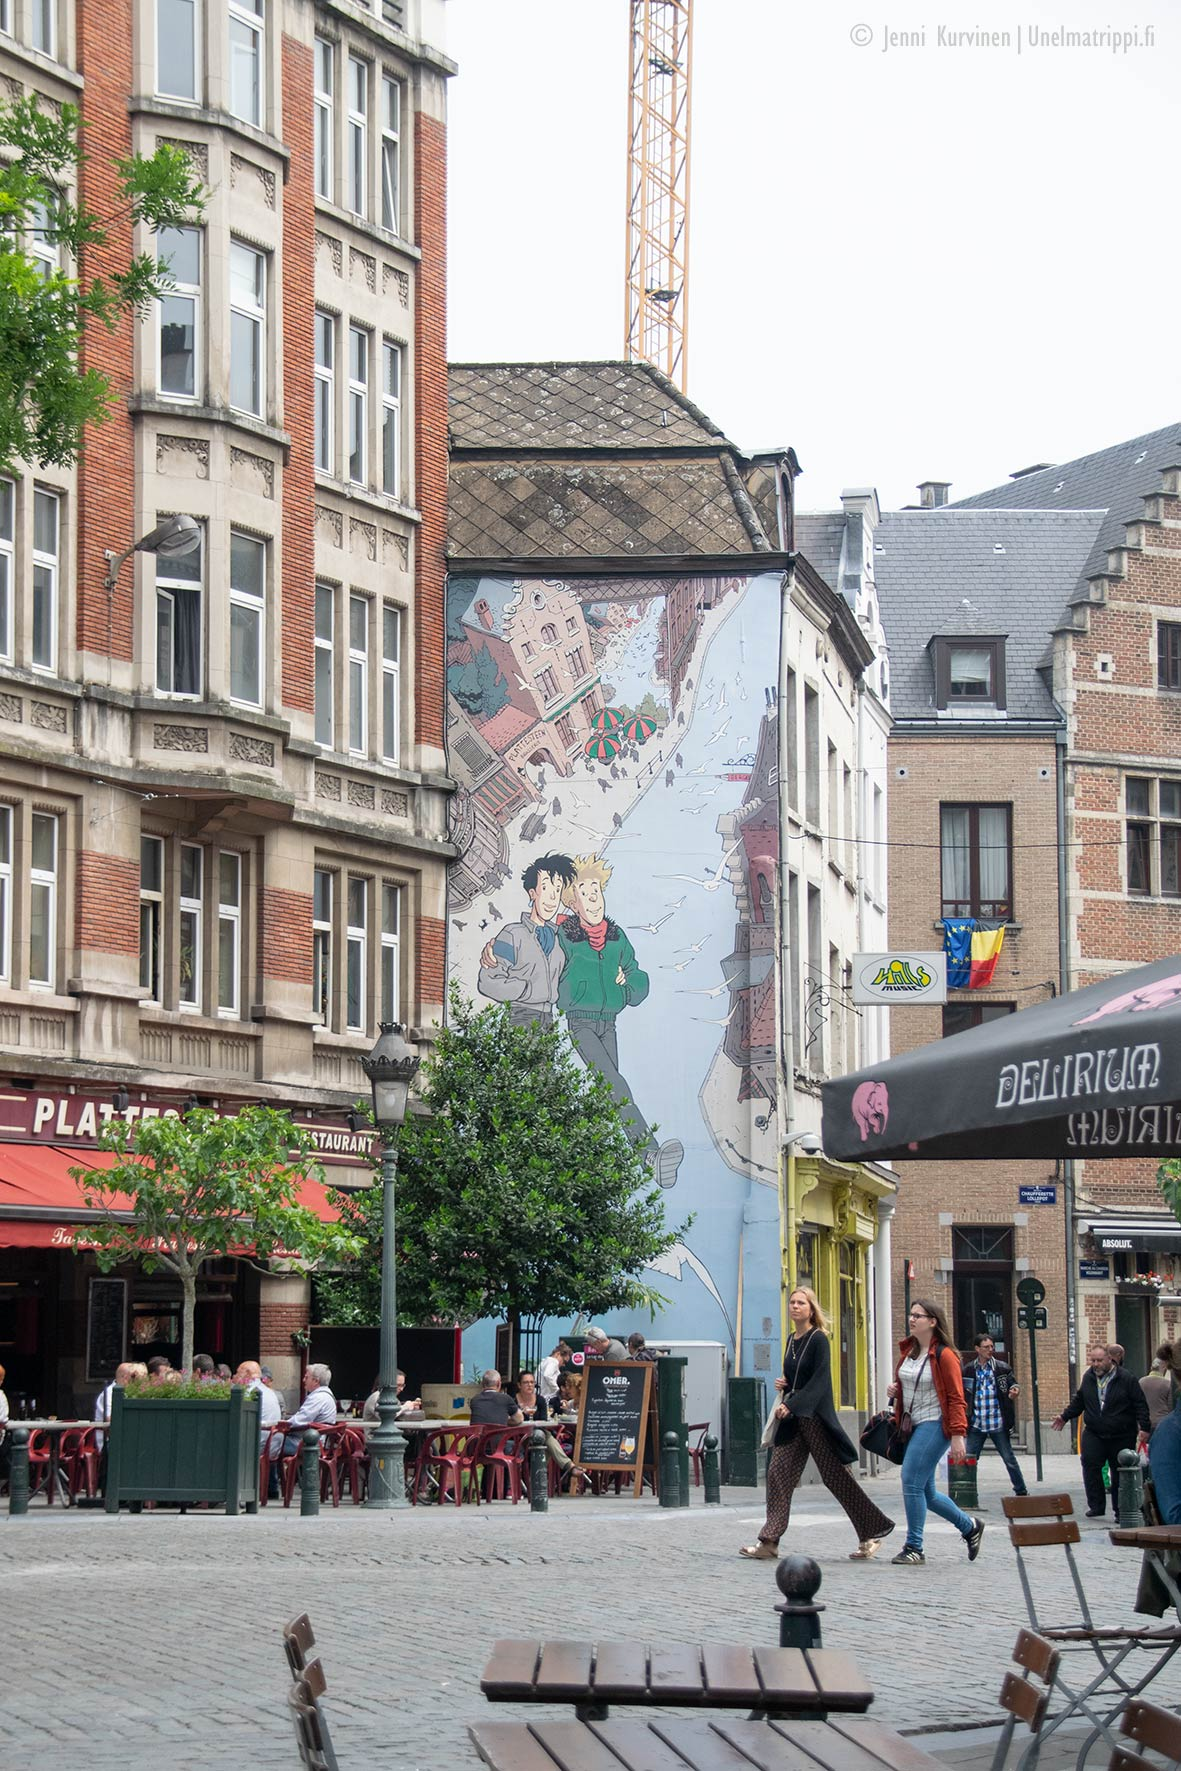 20180930-Unelmatrippi-Bryssel-DSC0884